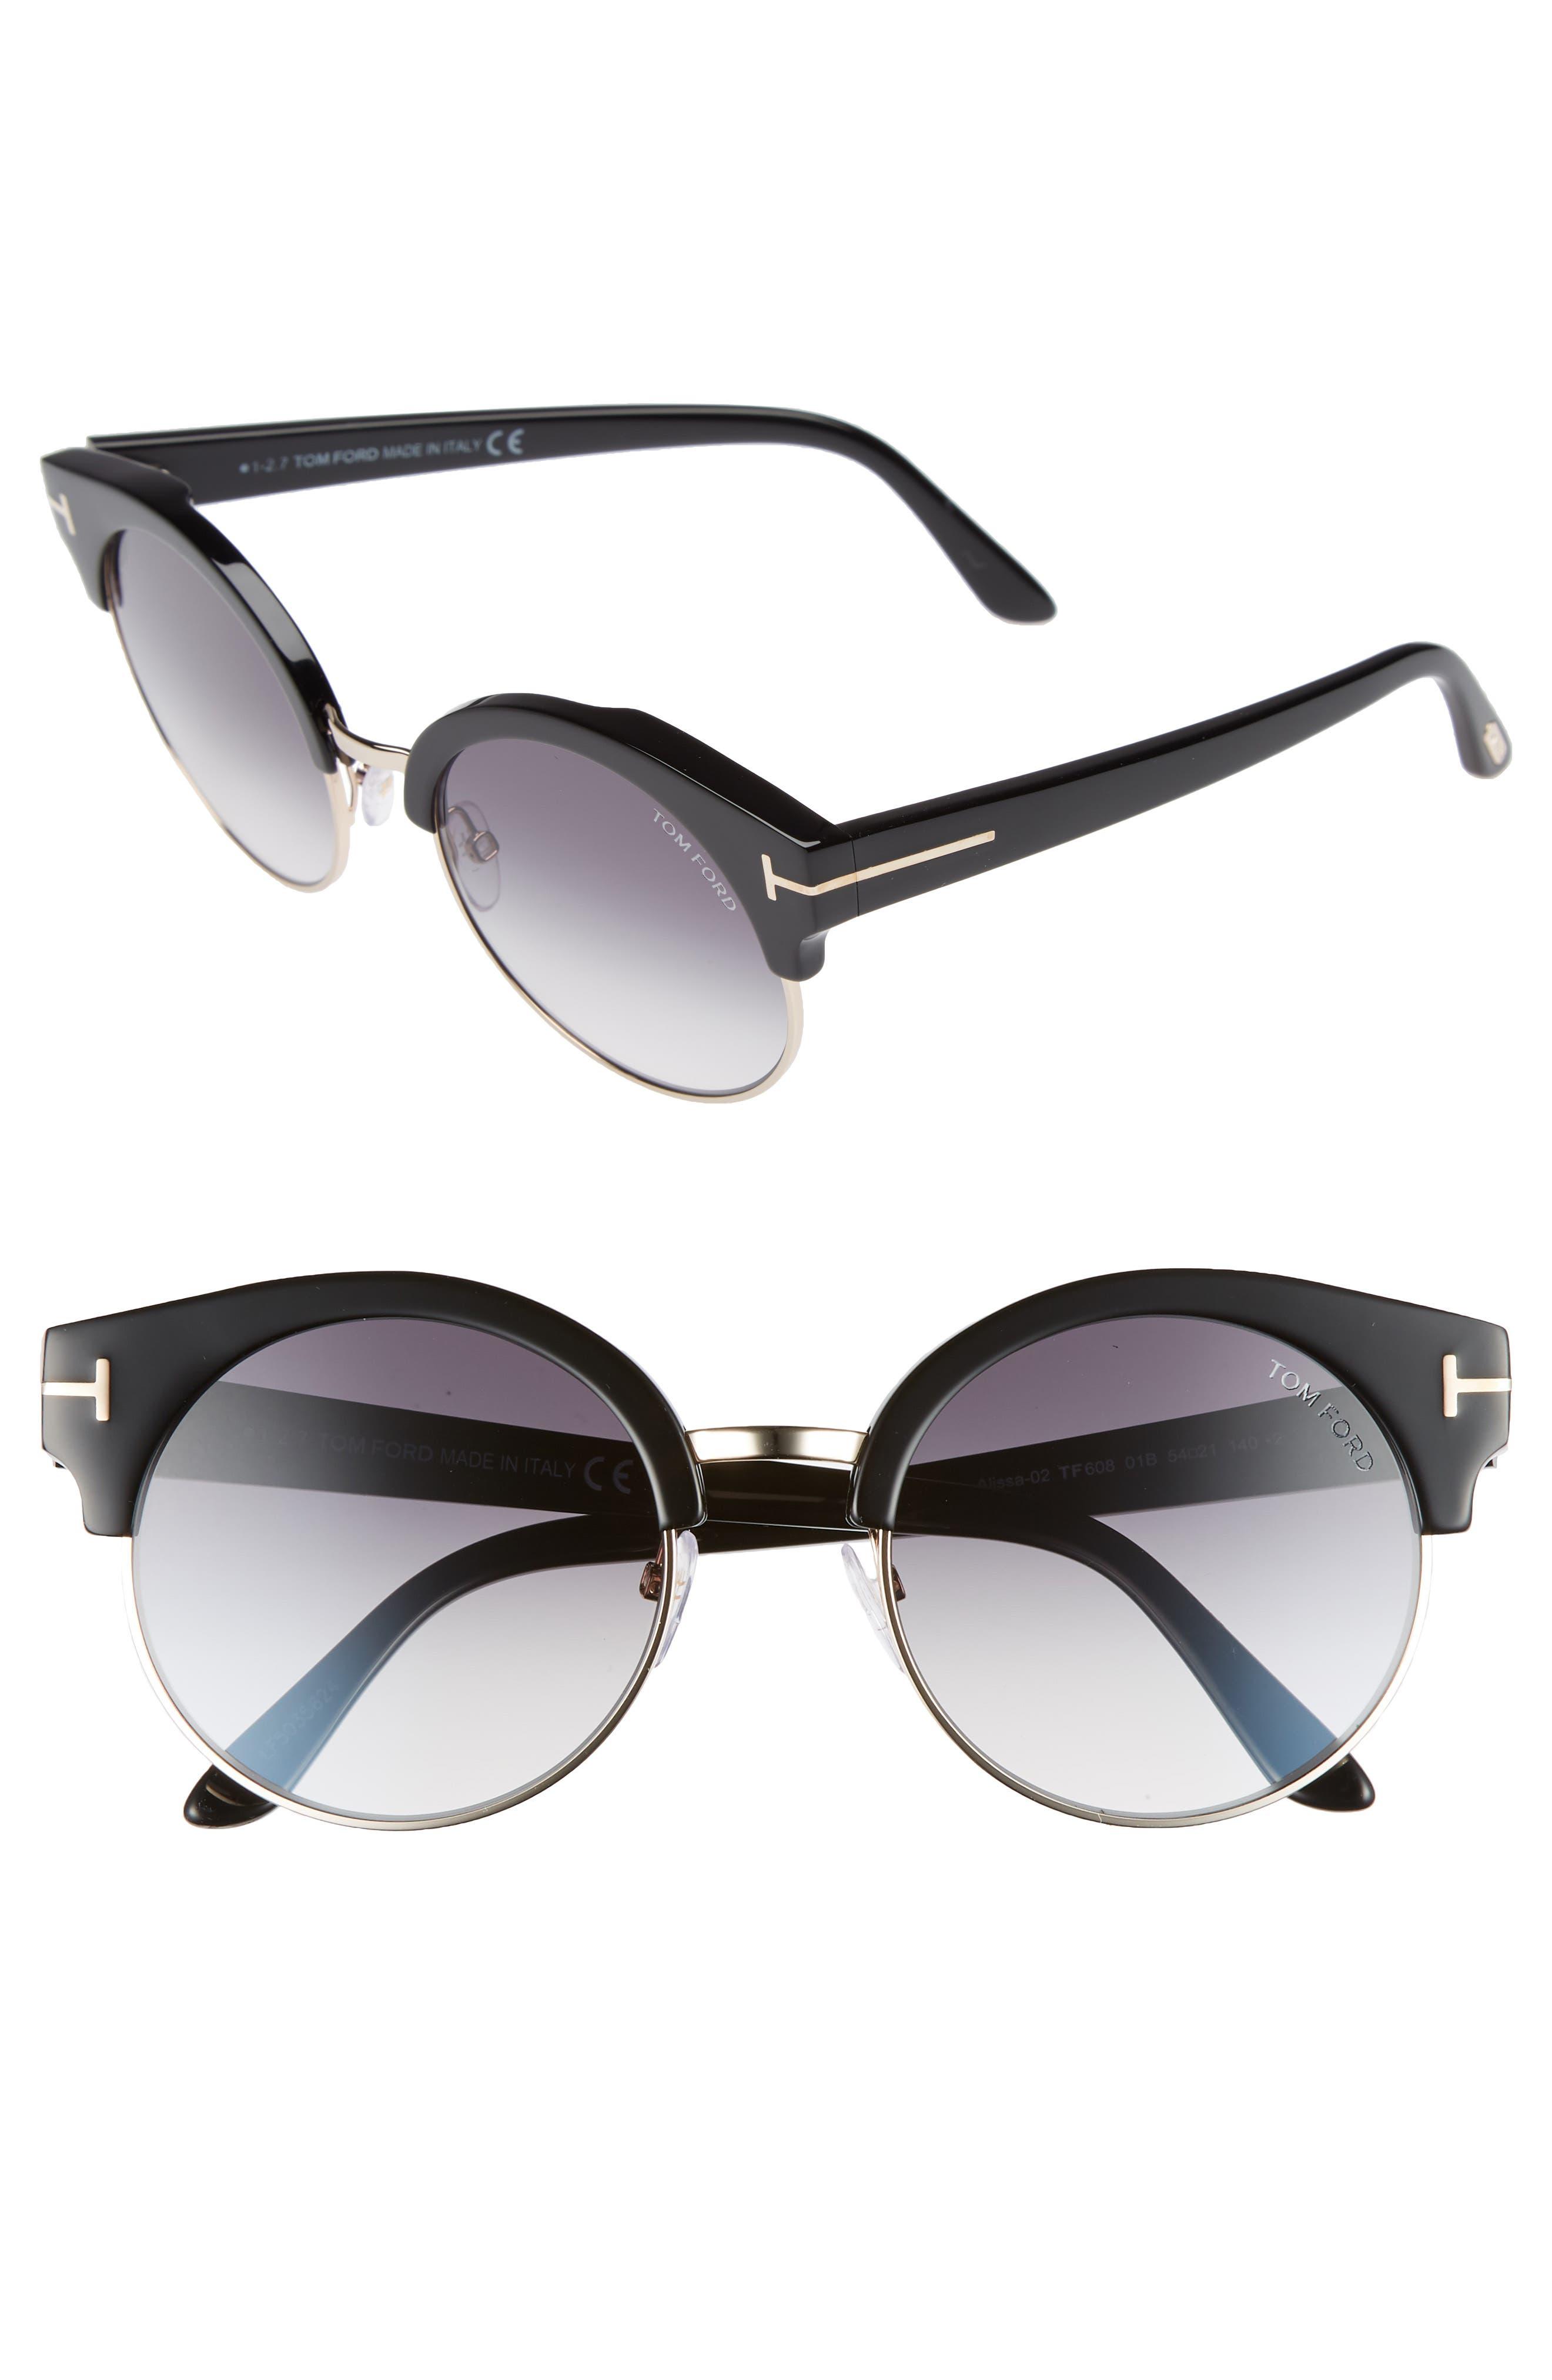 Main Image - Tom Ford Alissa 54mm Sunglasses